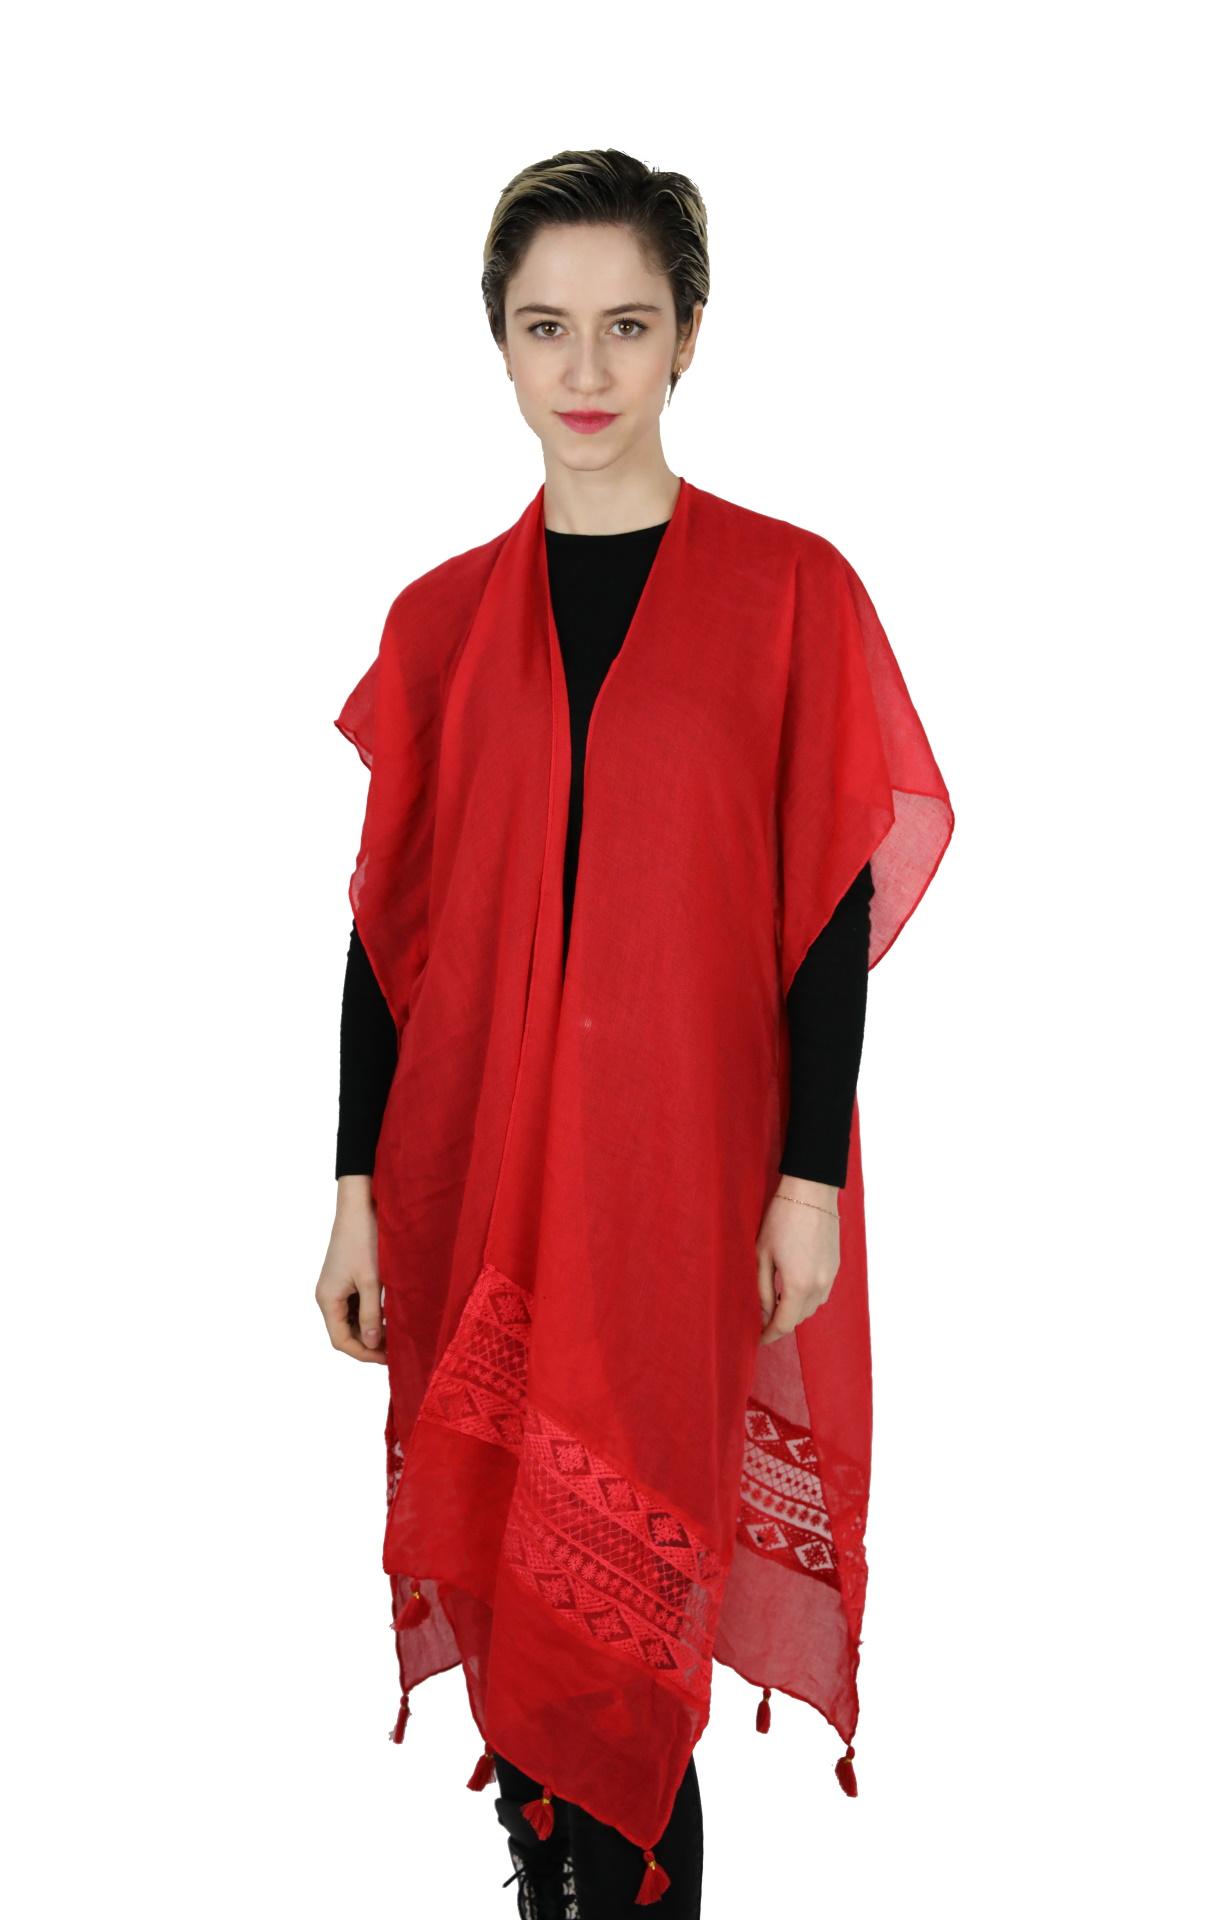 CLOTHES17/9 STOLA DONNA FOULARD CARDIGAN COPRISPALLE